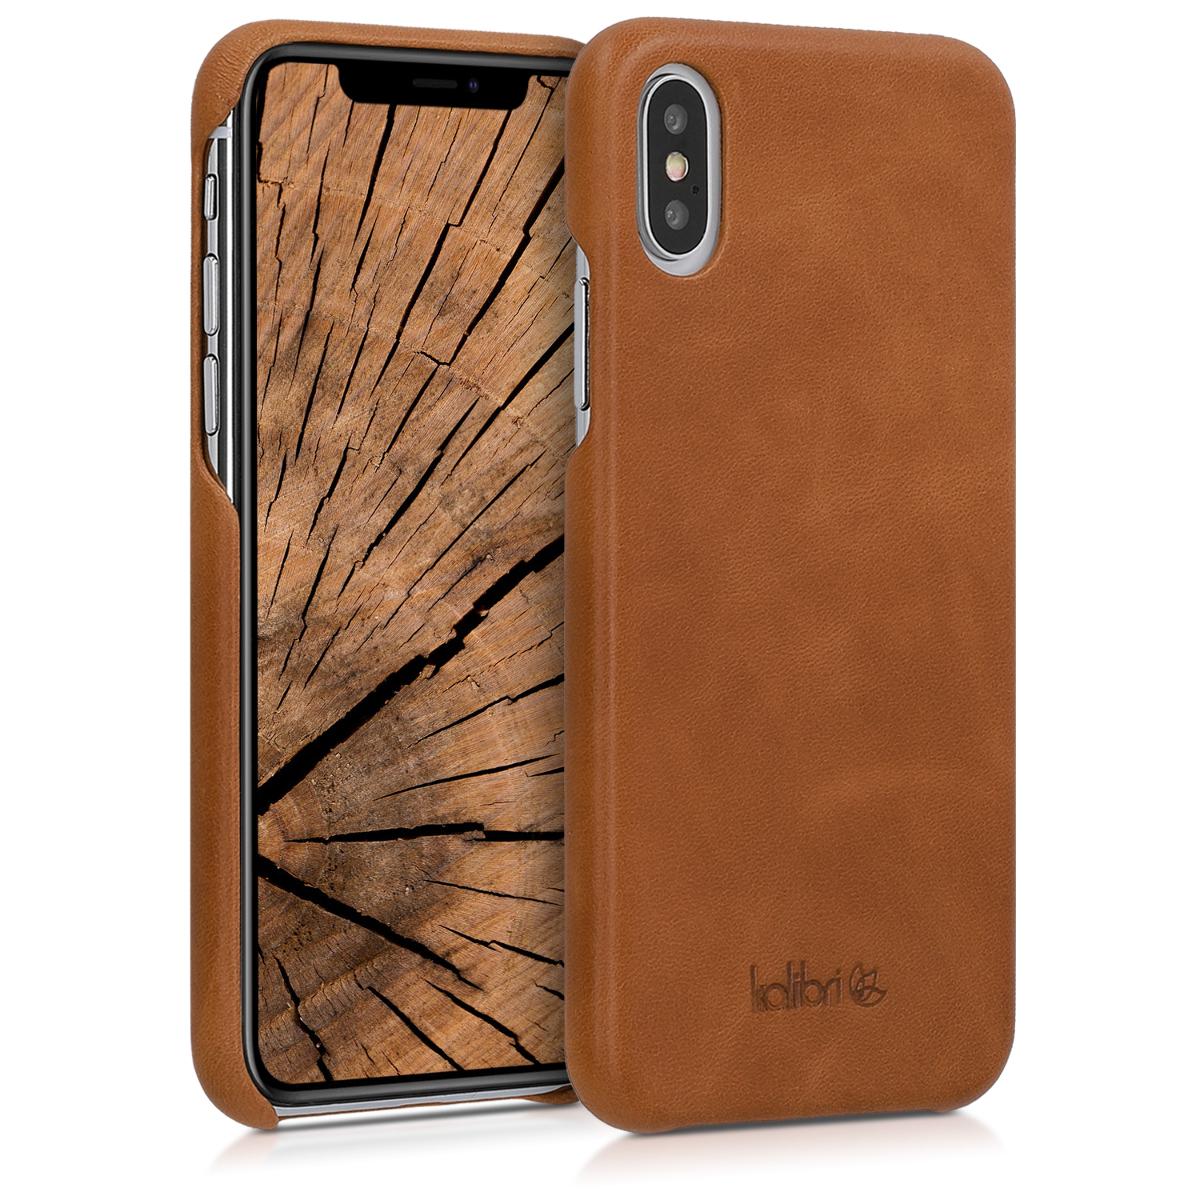 Kalibri Σκληρή Δερμάτινη Θήκη iPhone XS  - Cognac (46274.83)